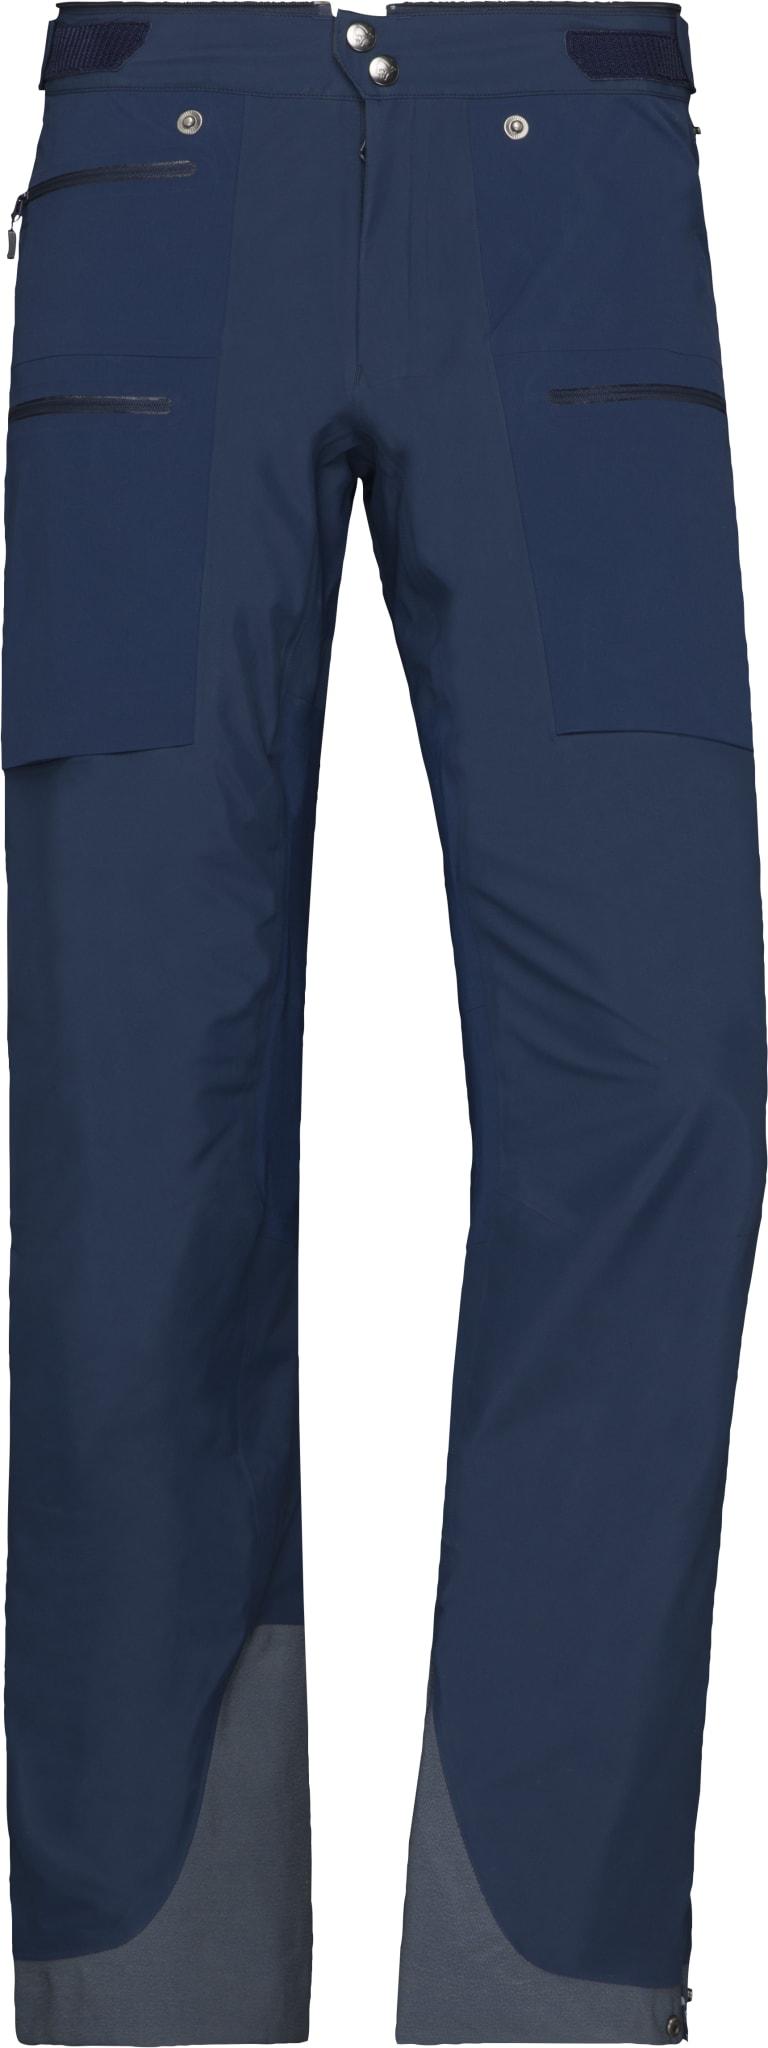 Lyngen Infinium Hybrid Pants W